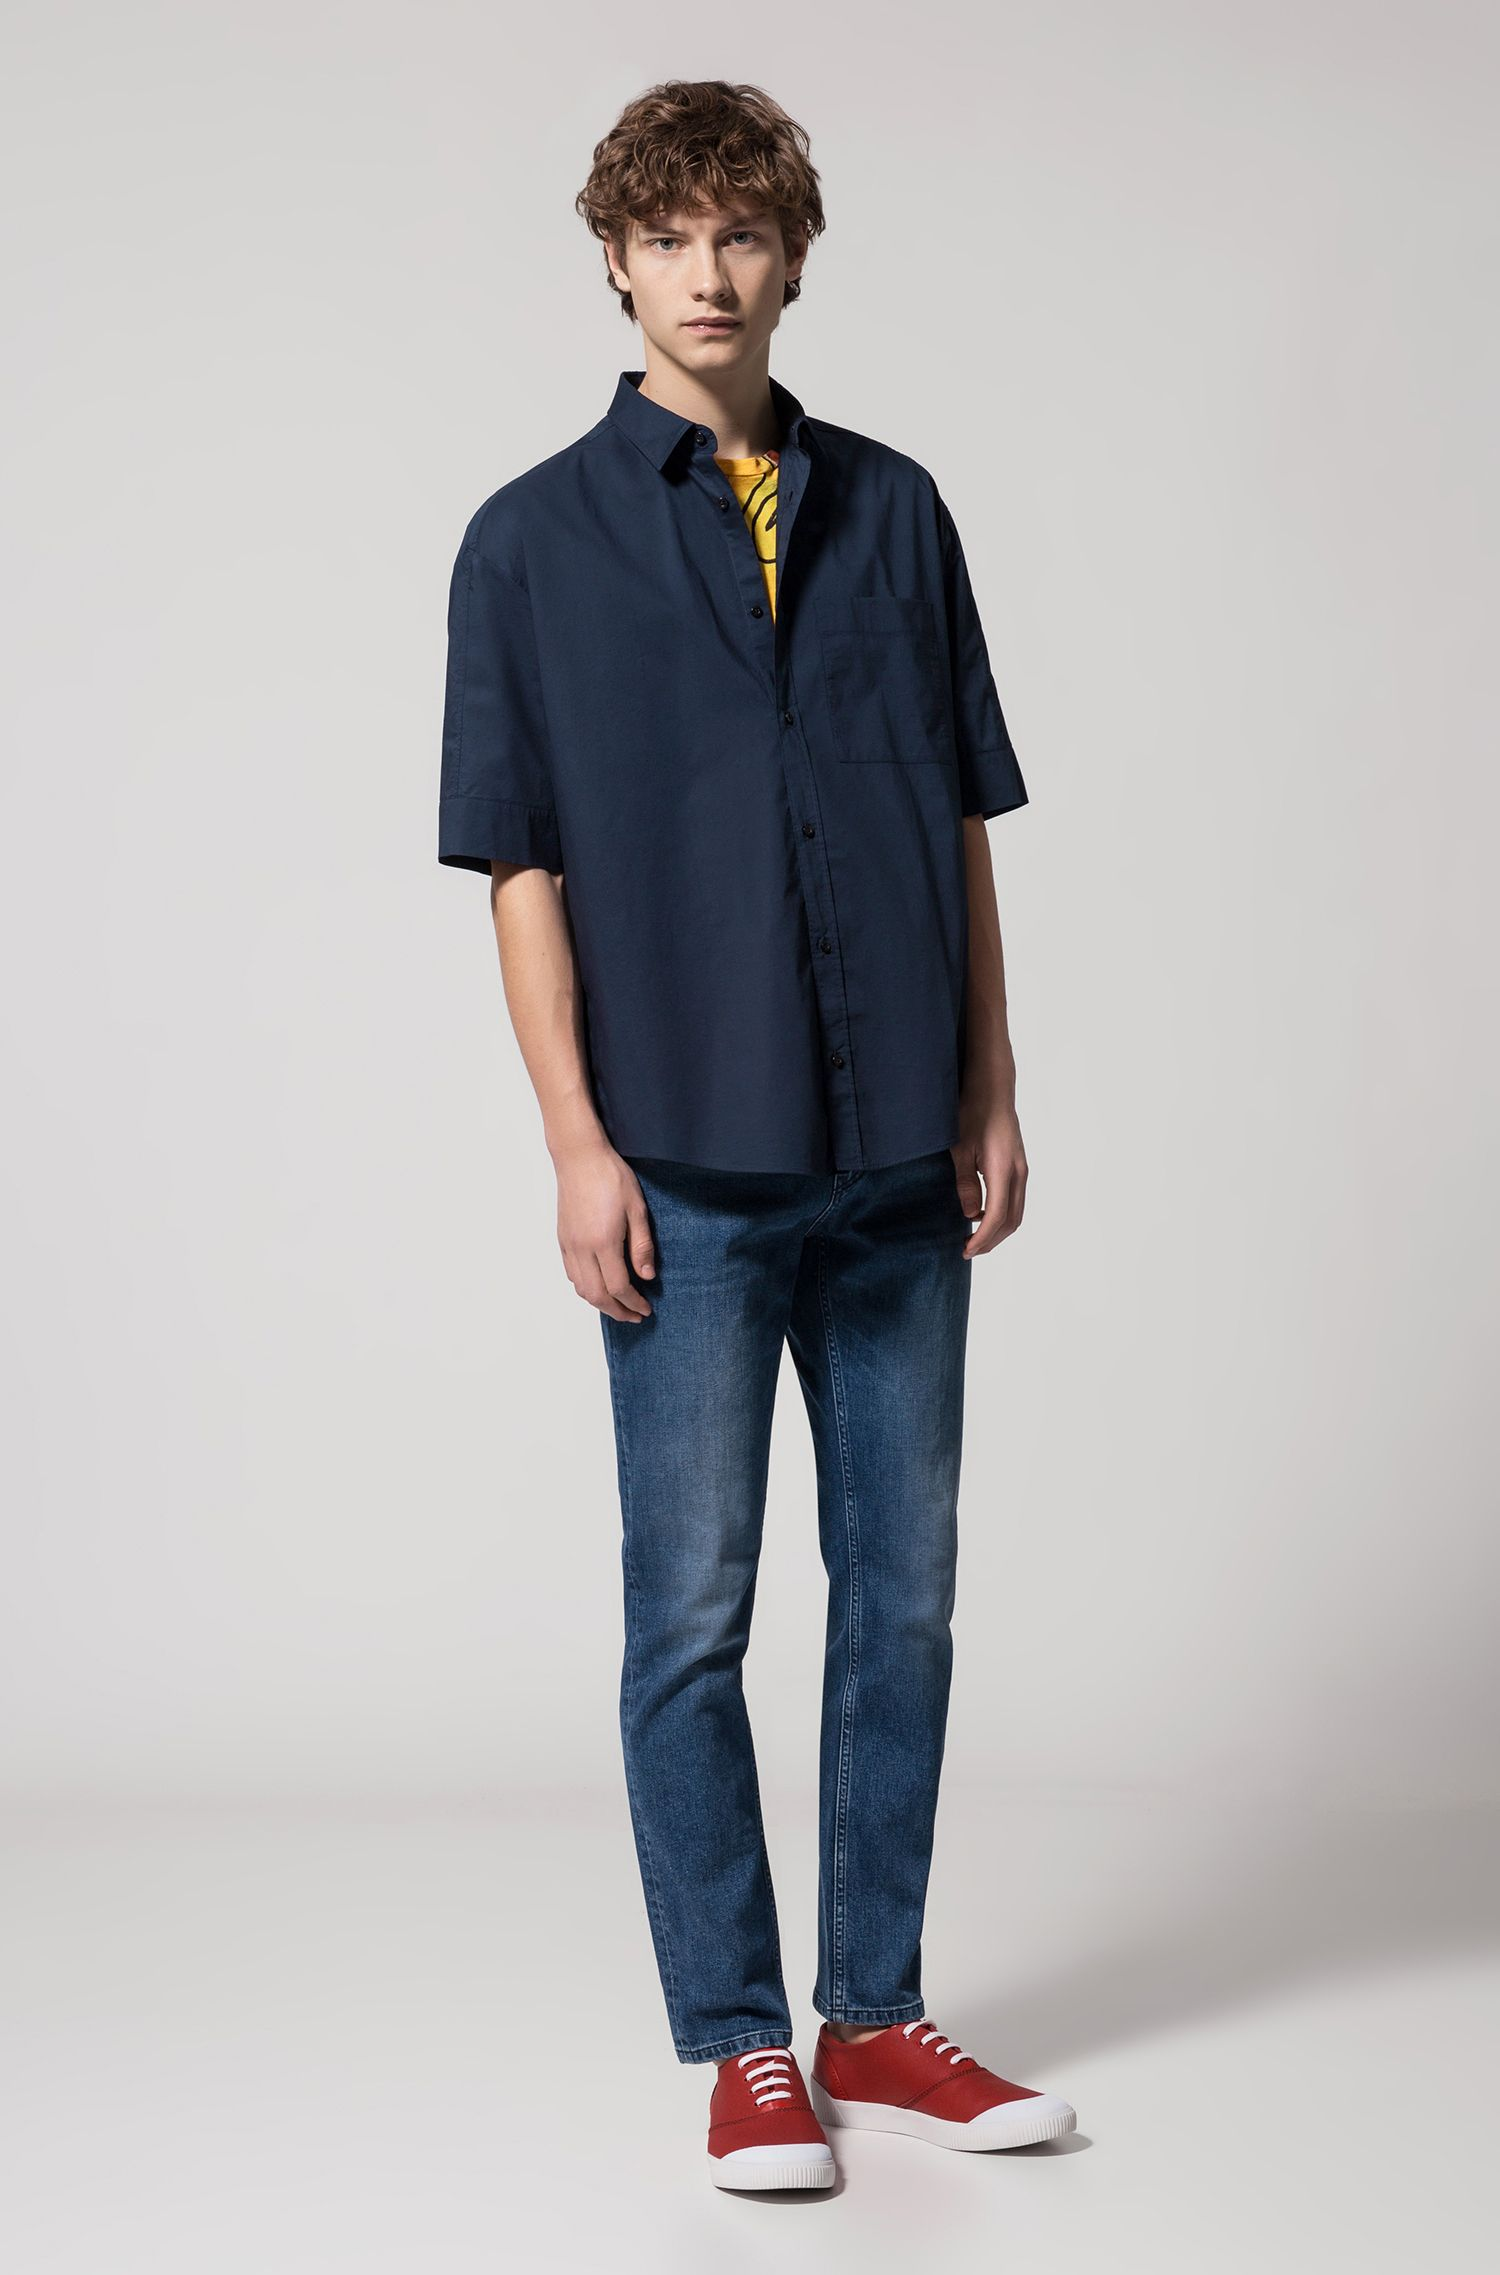 Cotton Sport Shirt, Oversize Fit | Eynold